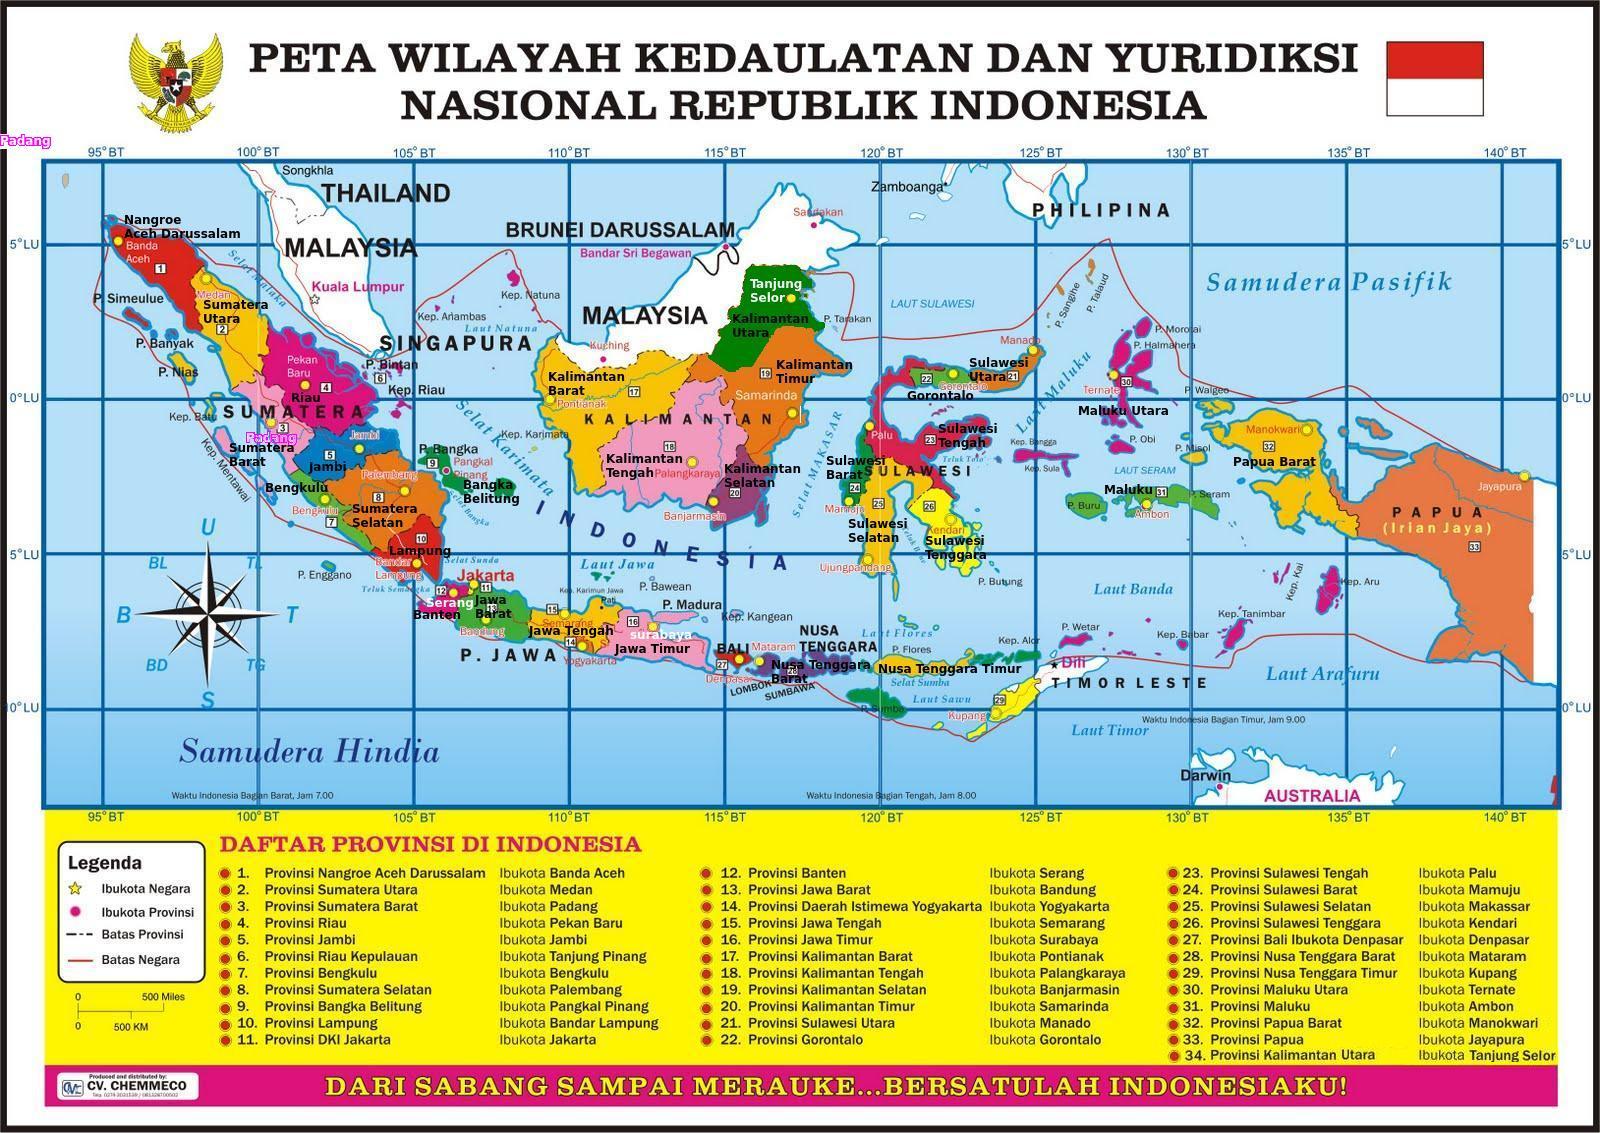 Inilah Peta Indonesia dengan 34 Propinsi. Ada tambahan propinsi baru ...